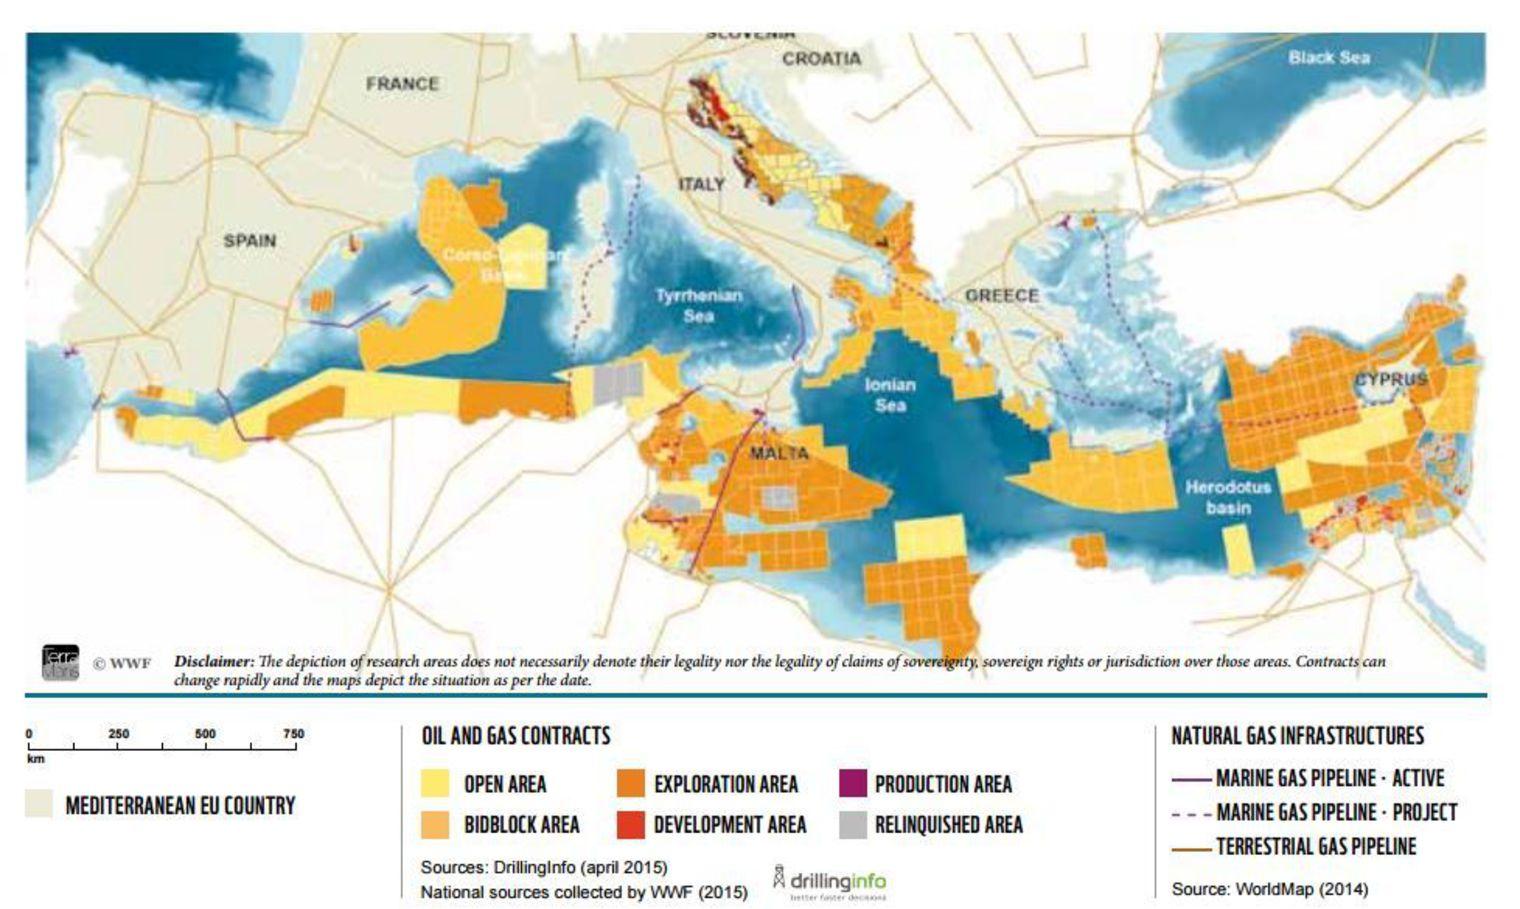 wwf-mediterranee_5500081